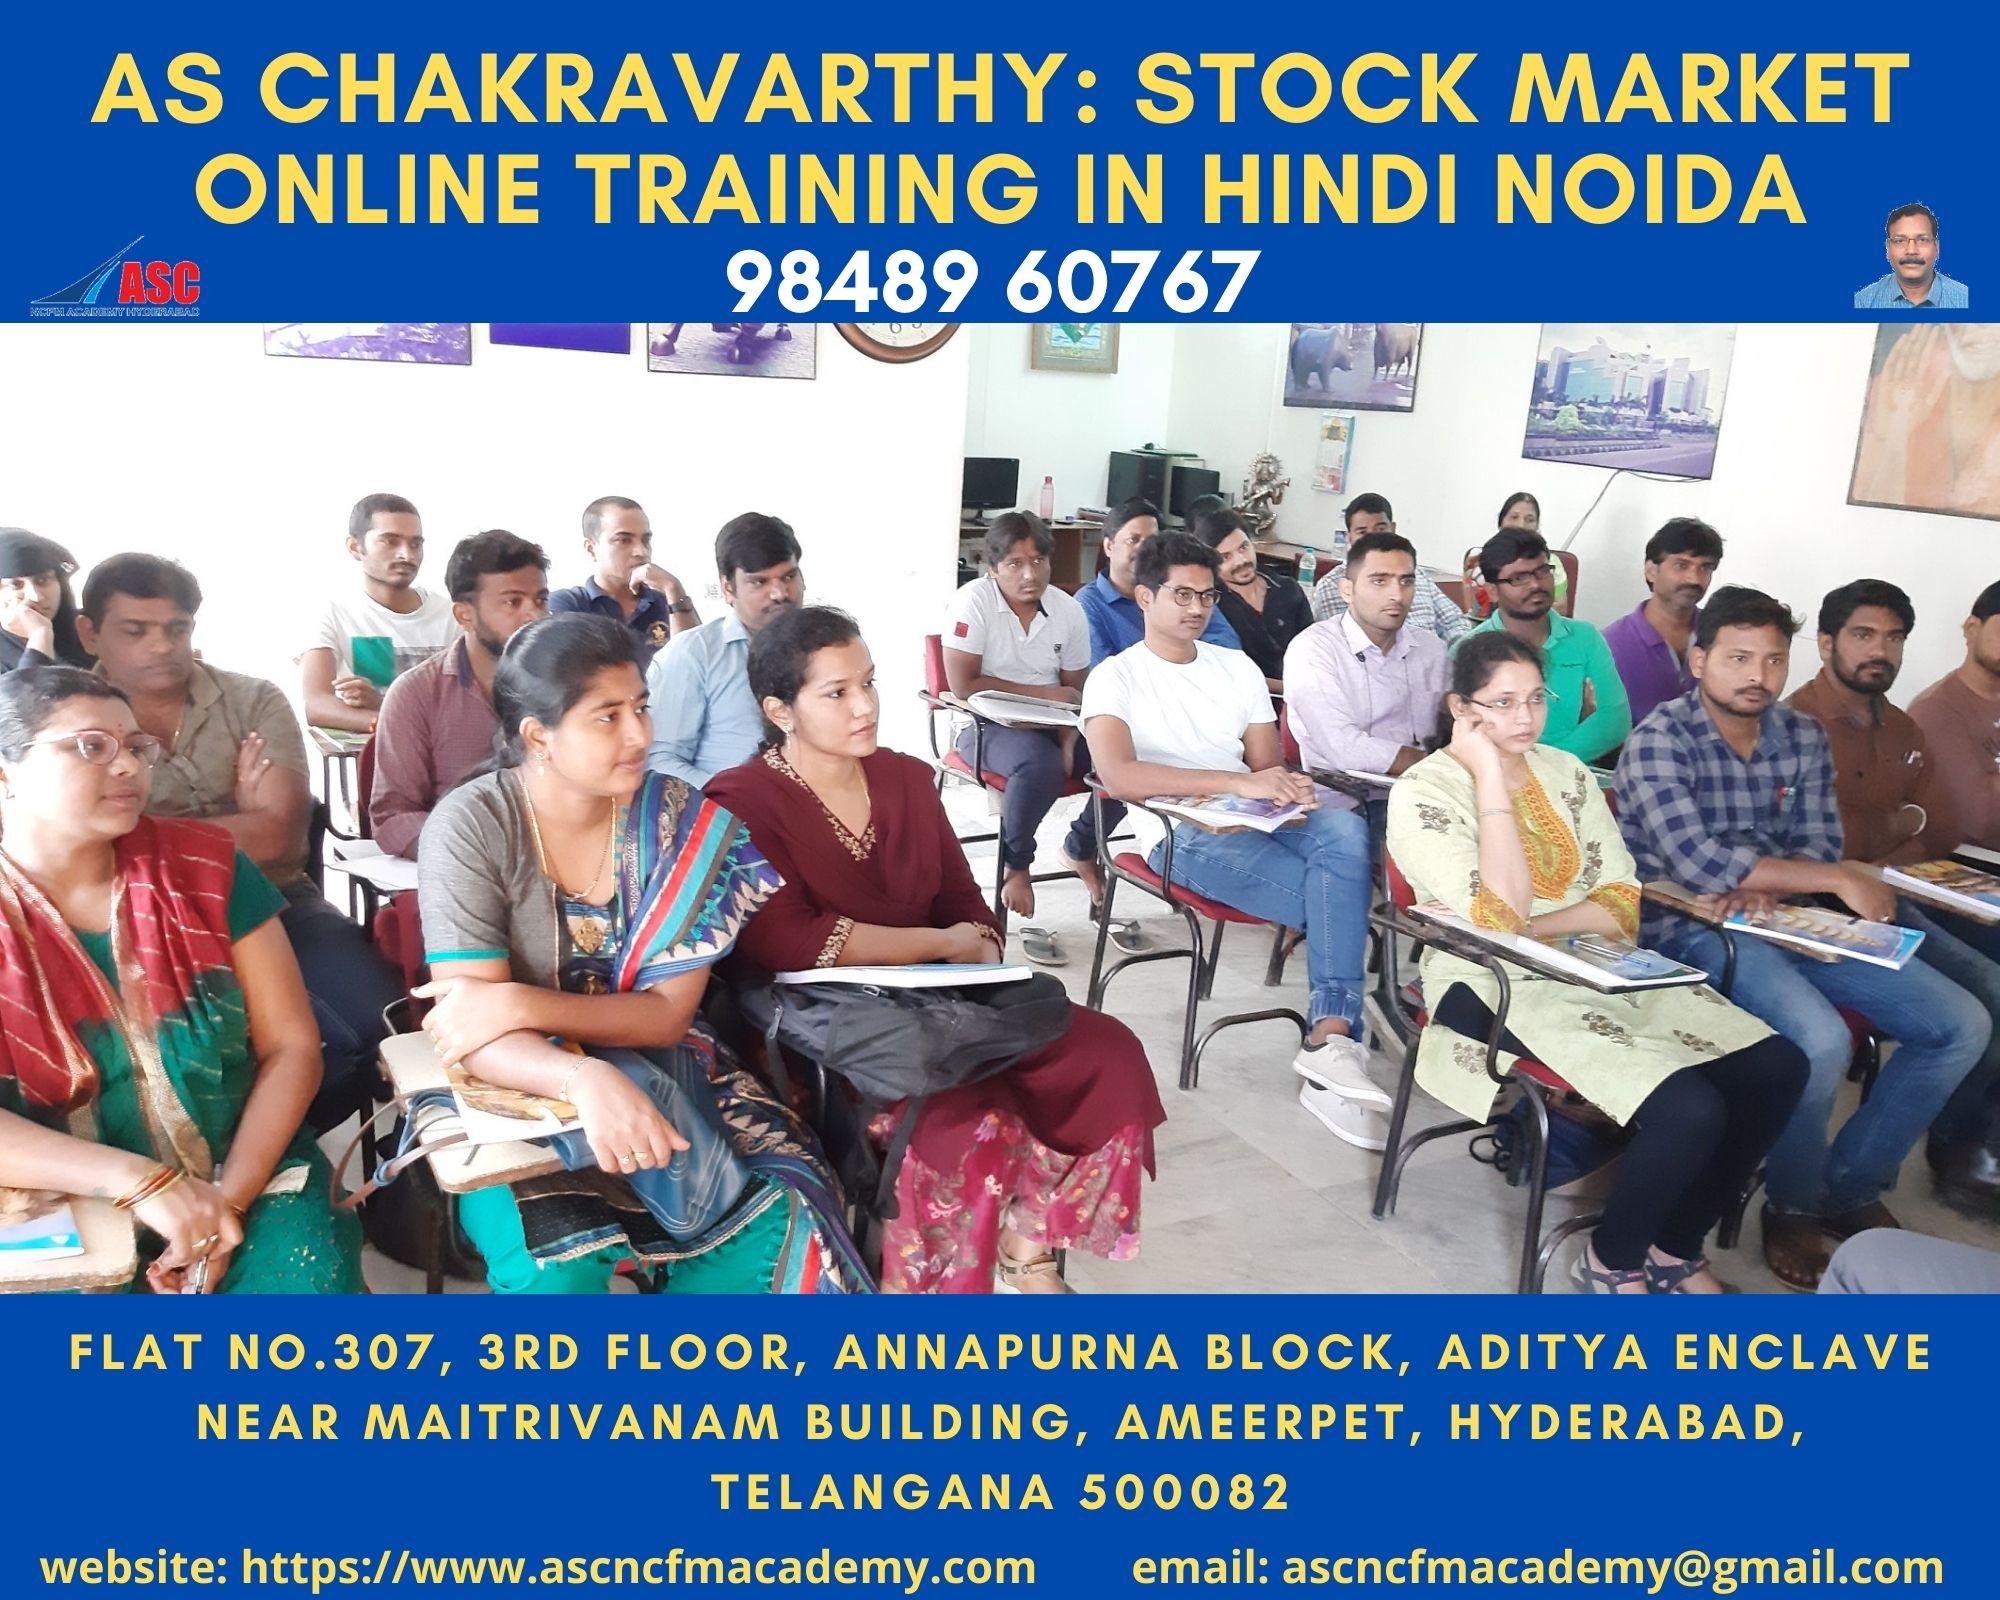 Online Stock Market Technical Training in Hindi Noida